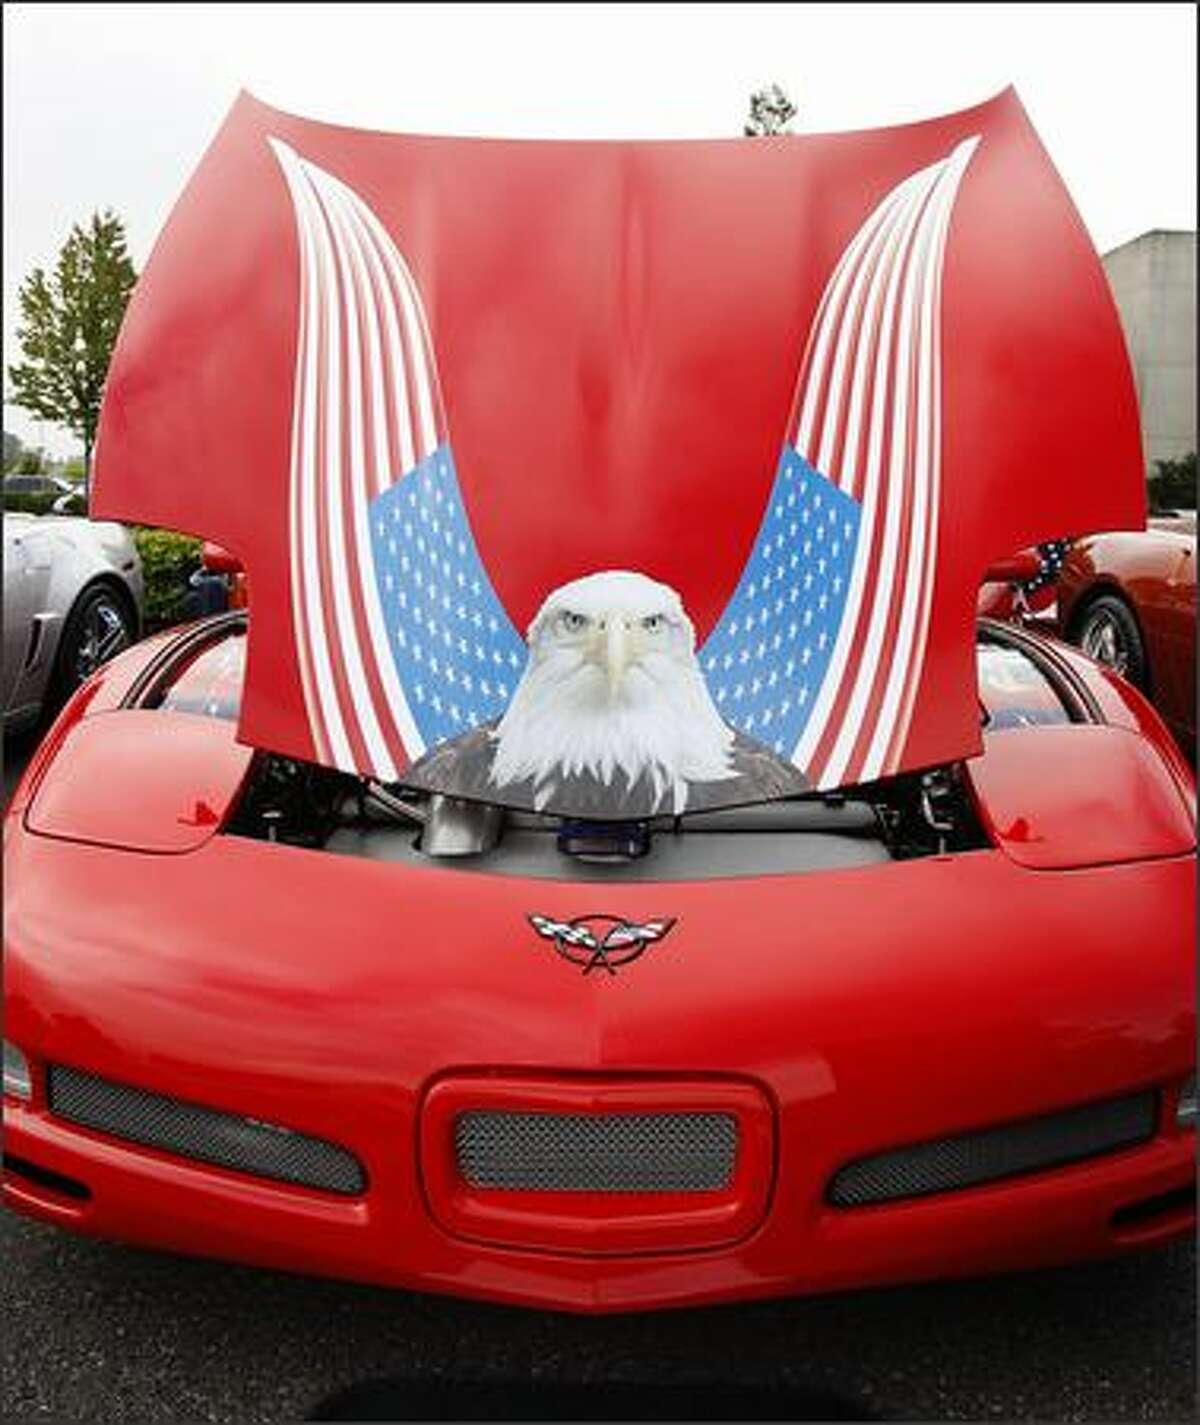 A patriotic Corvette on display.